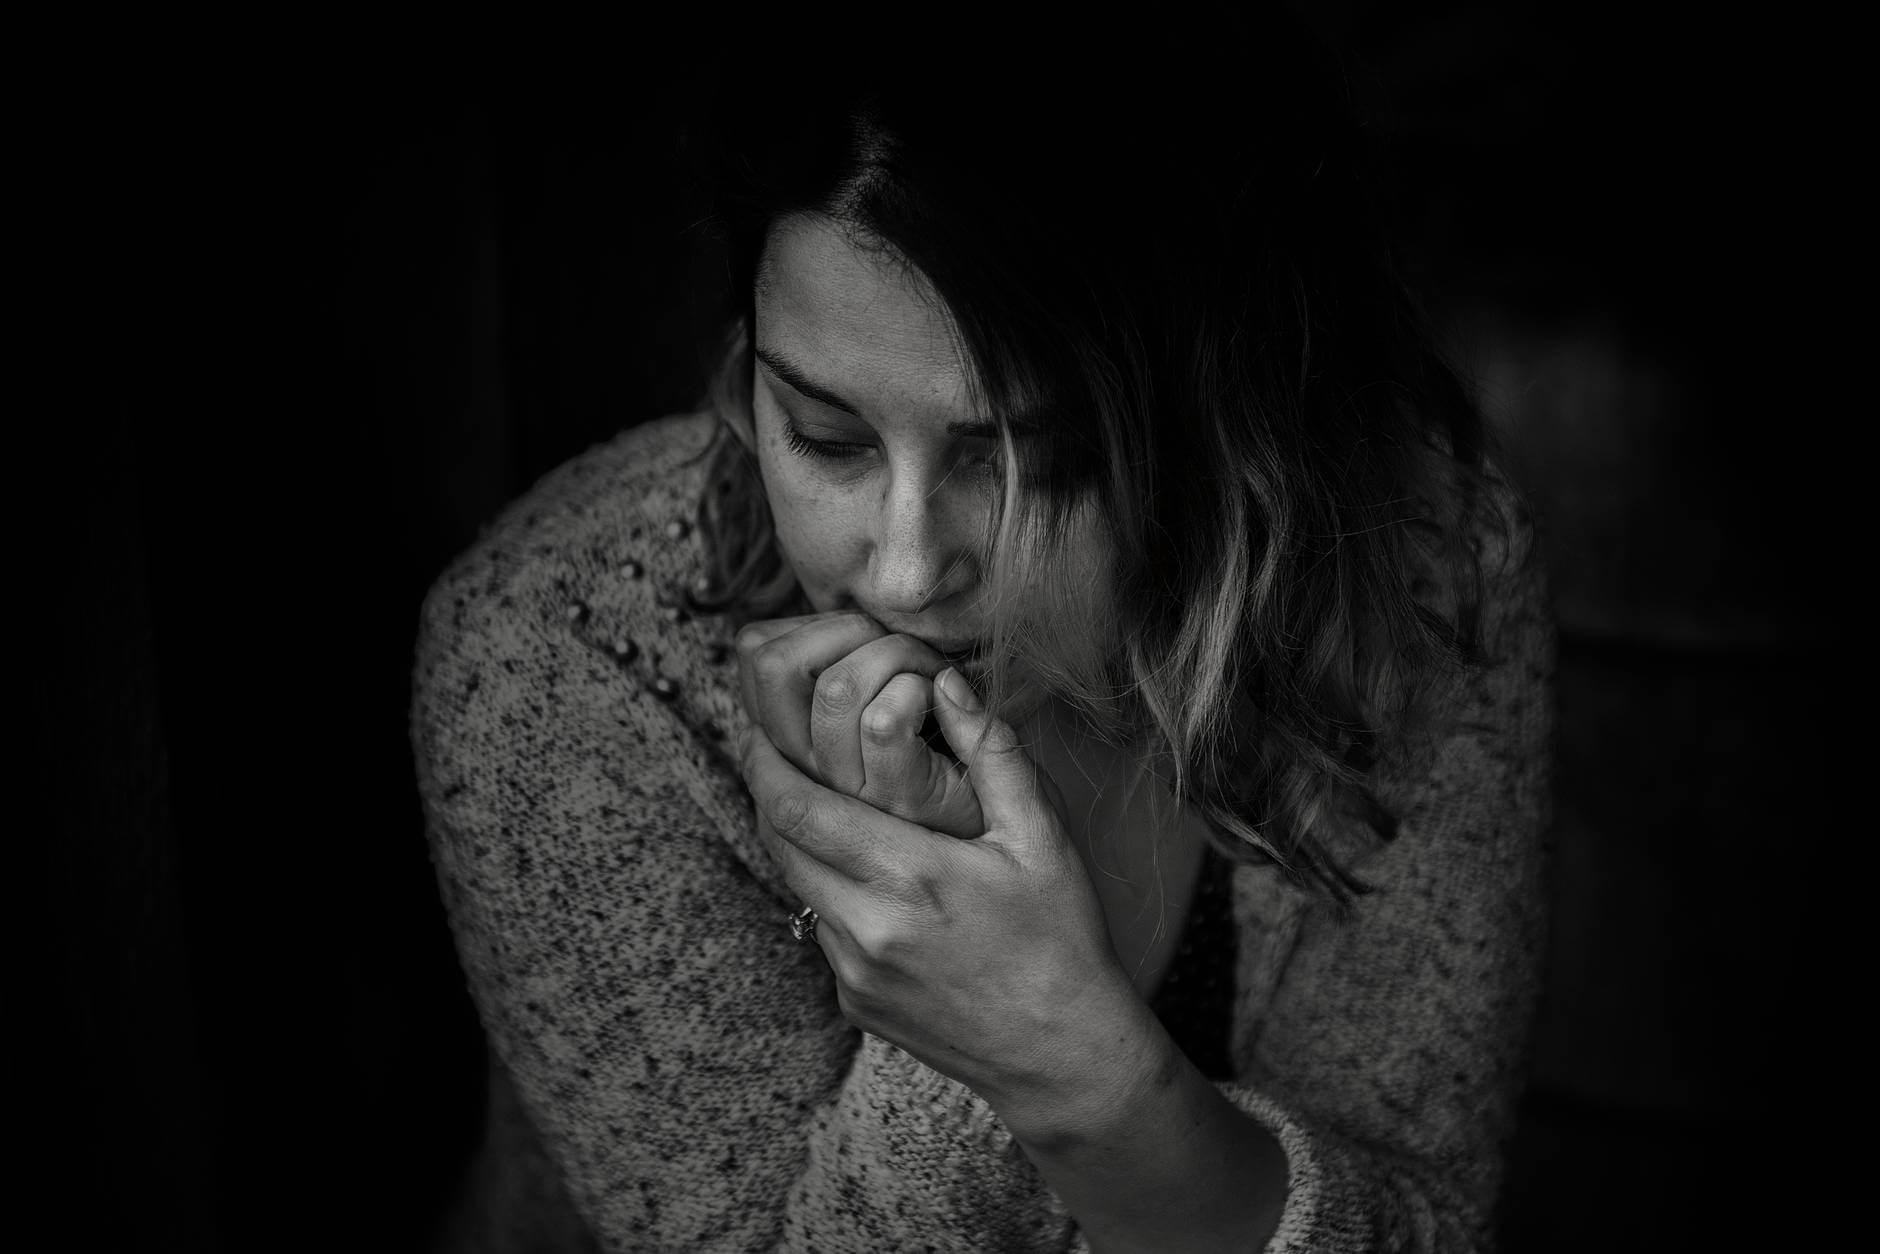 mujer depresion preocuada